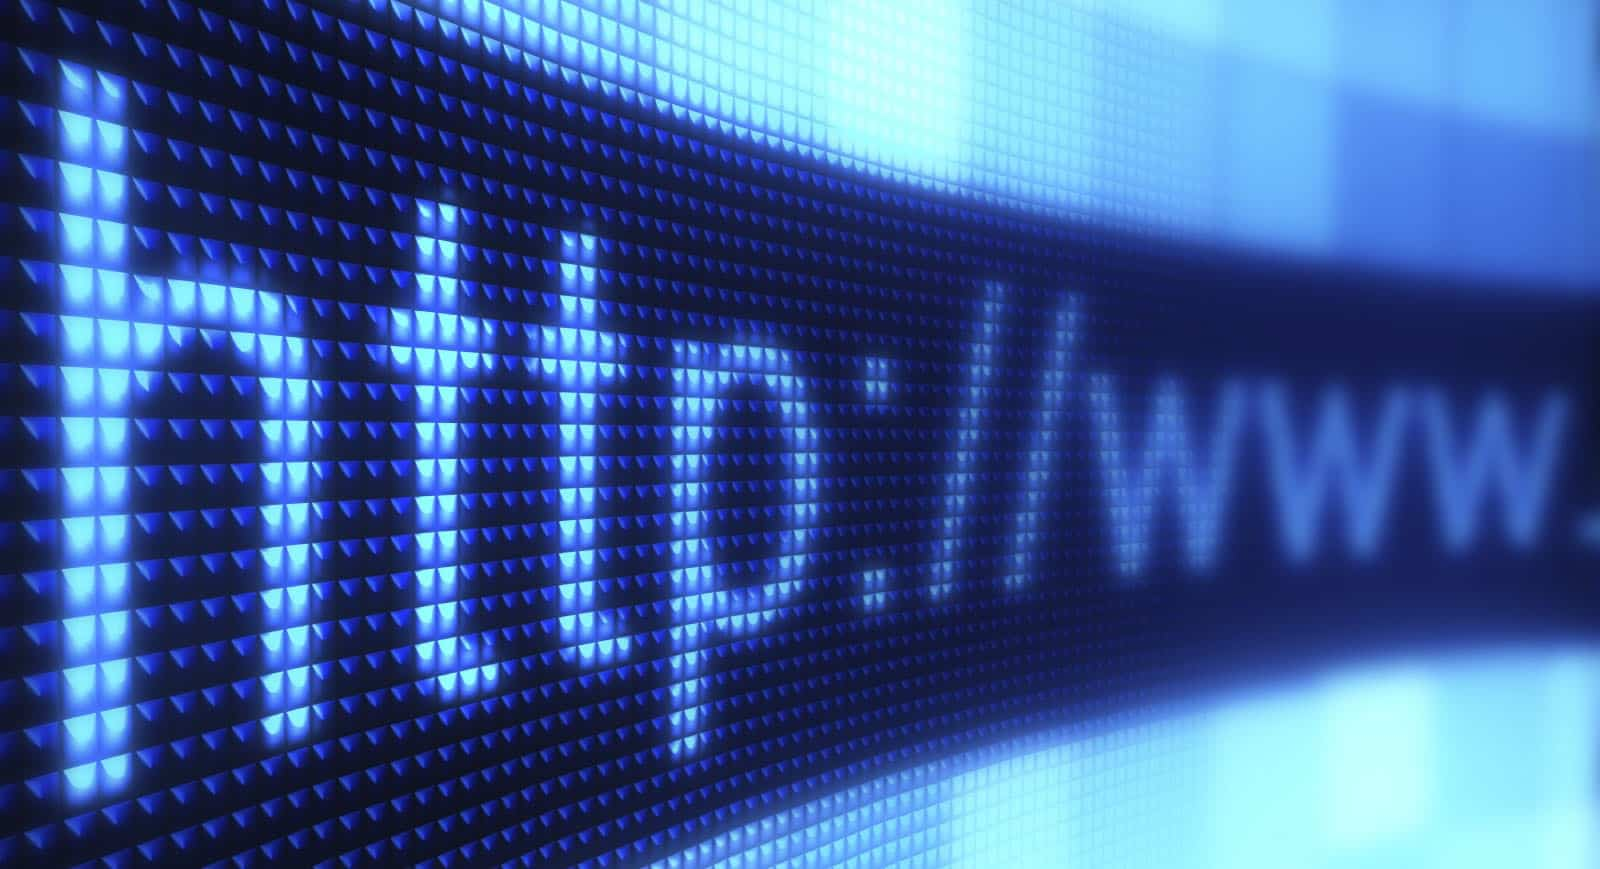 Judul Skripsi Teknik Informatika Berbasis Web Sahabatnesia